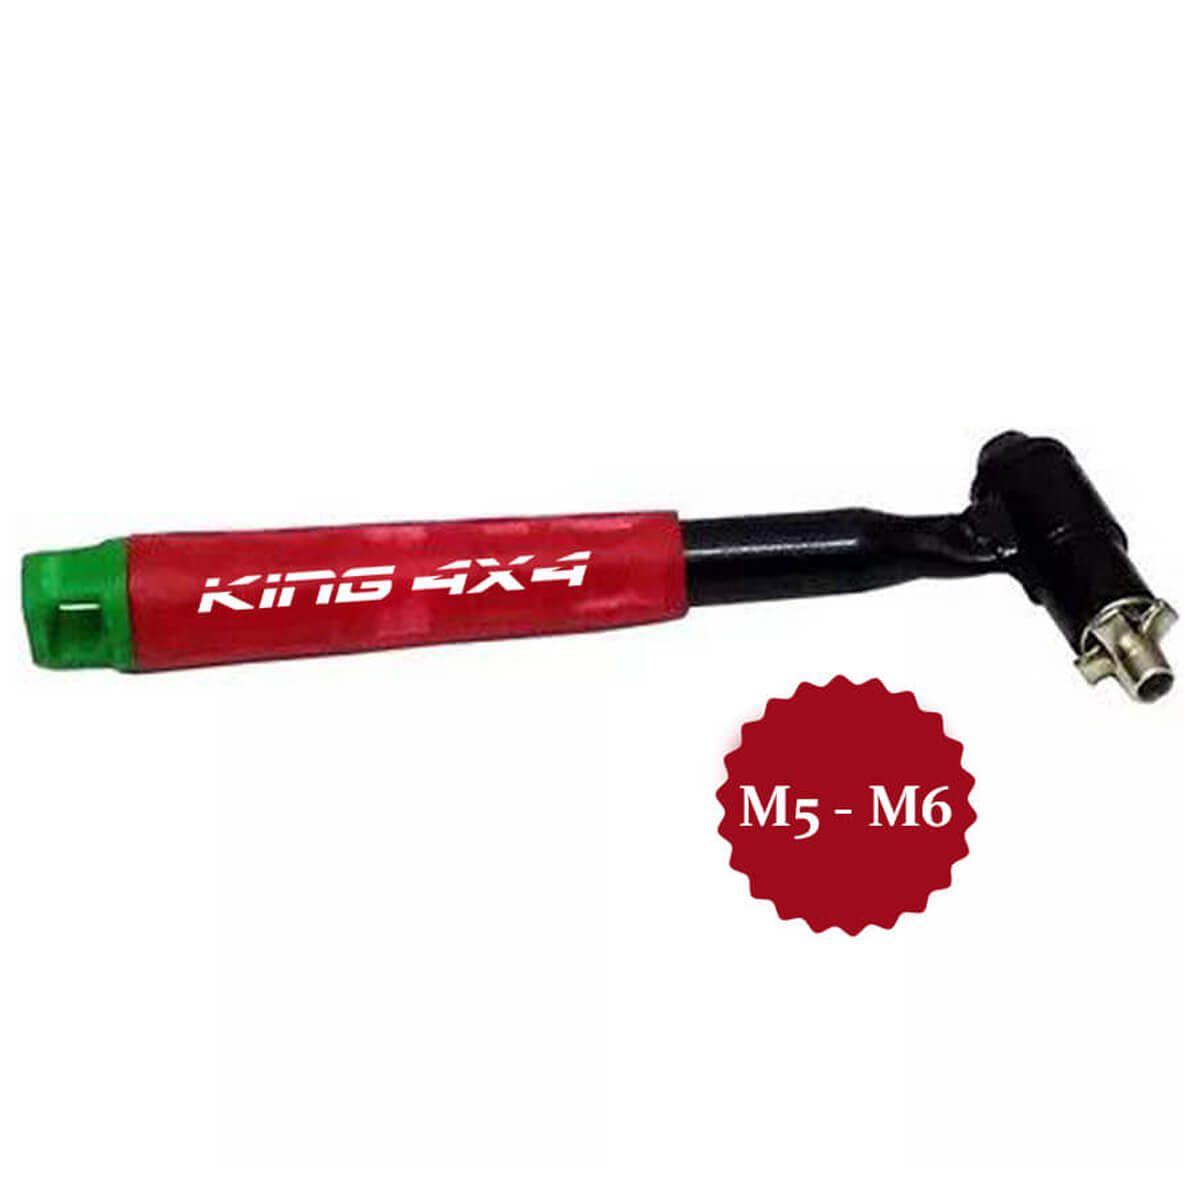 Rebitadeira KING 4x4| M5/M6 | Plusnut